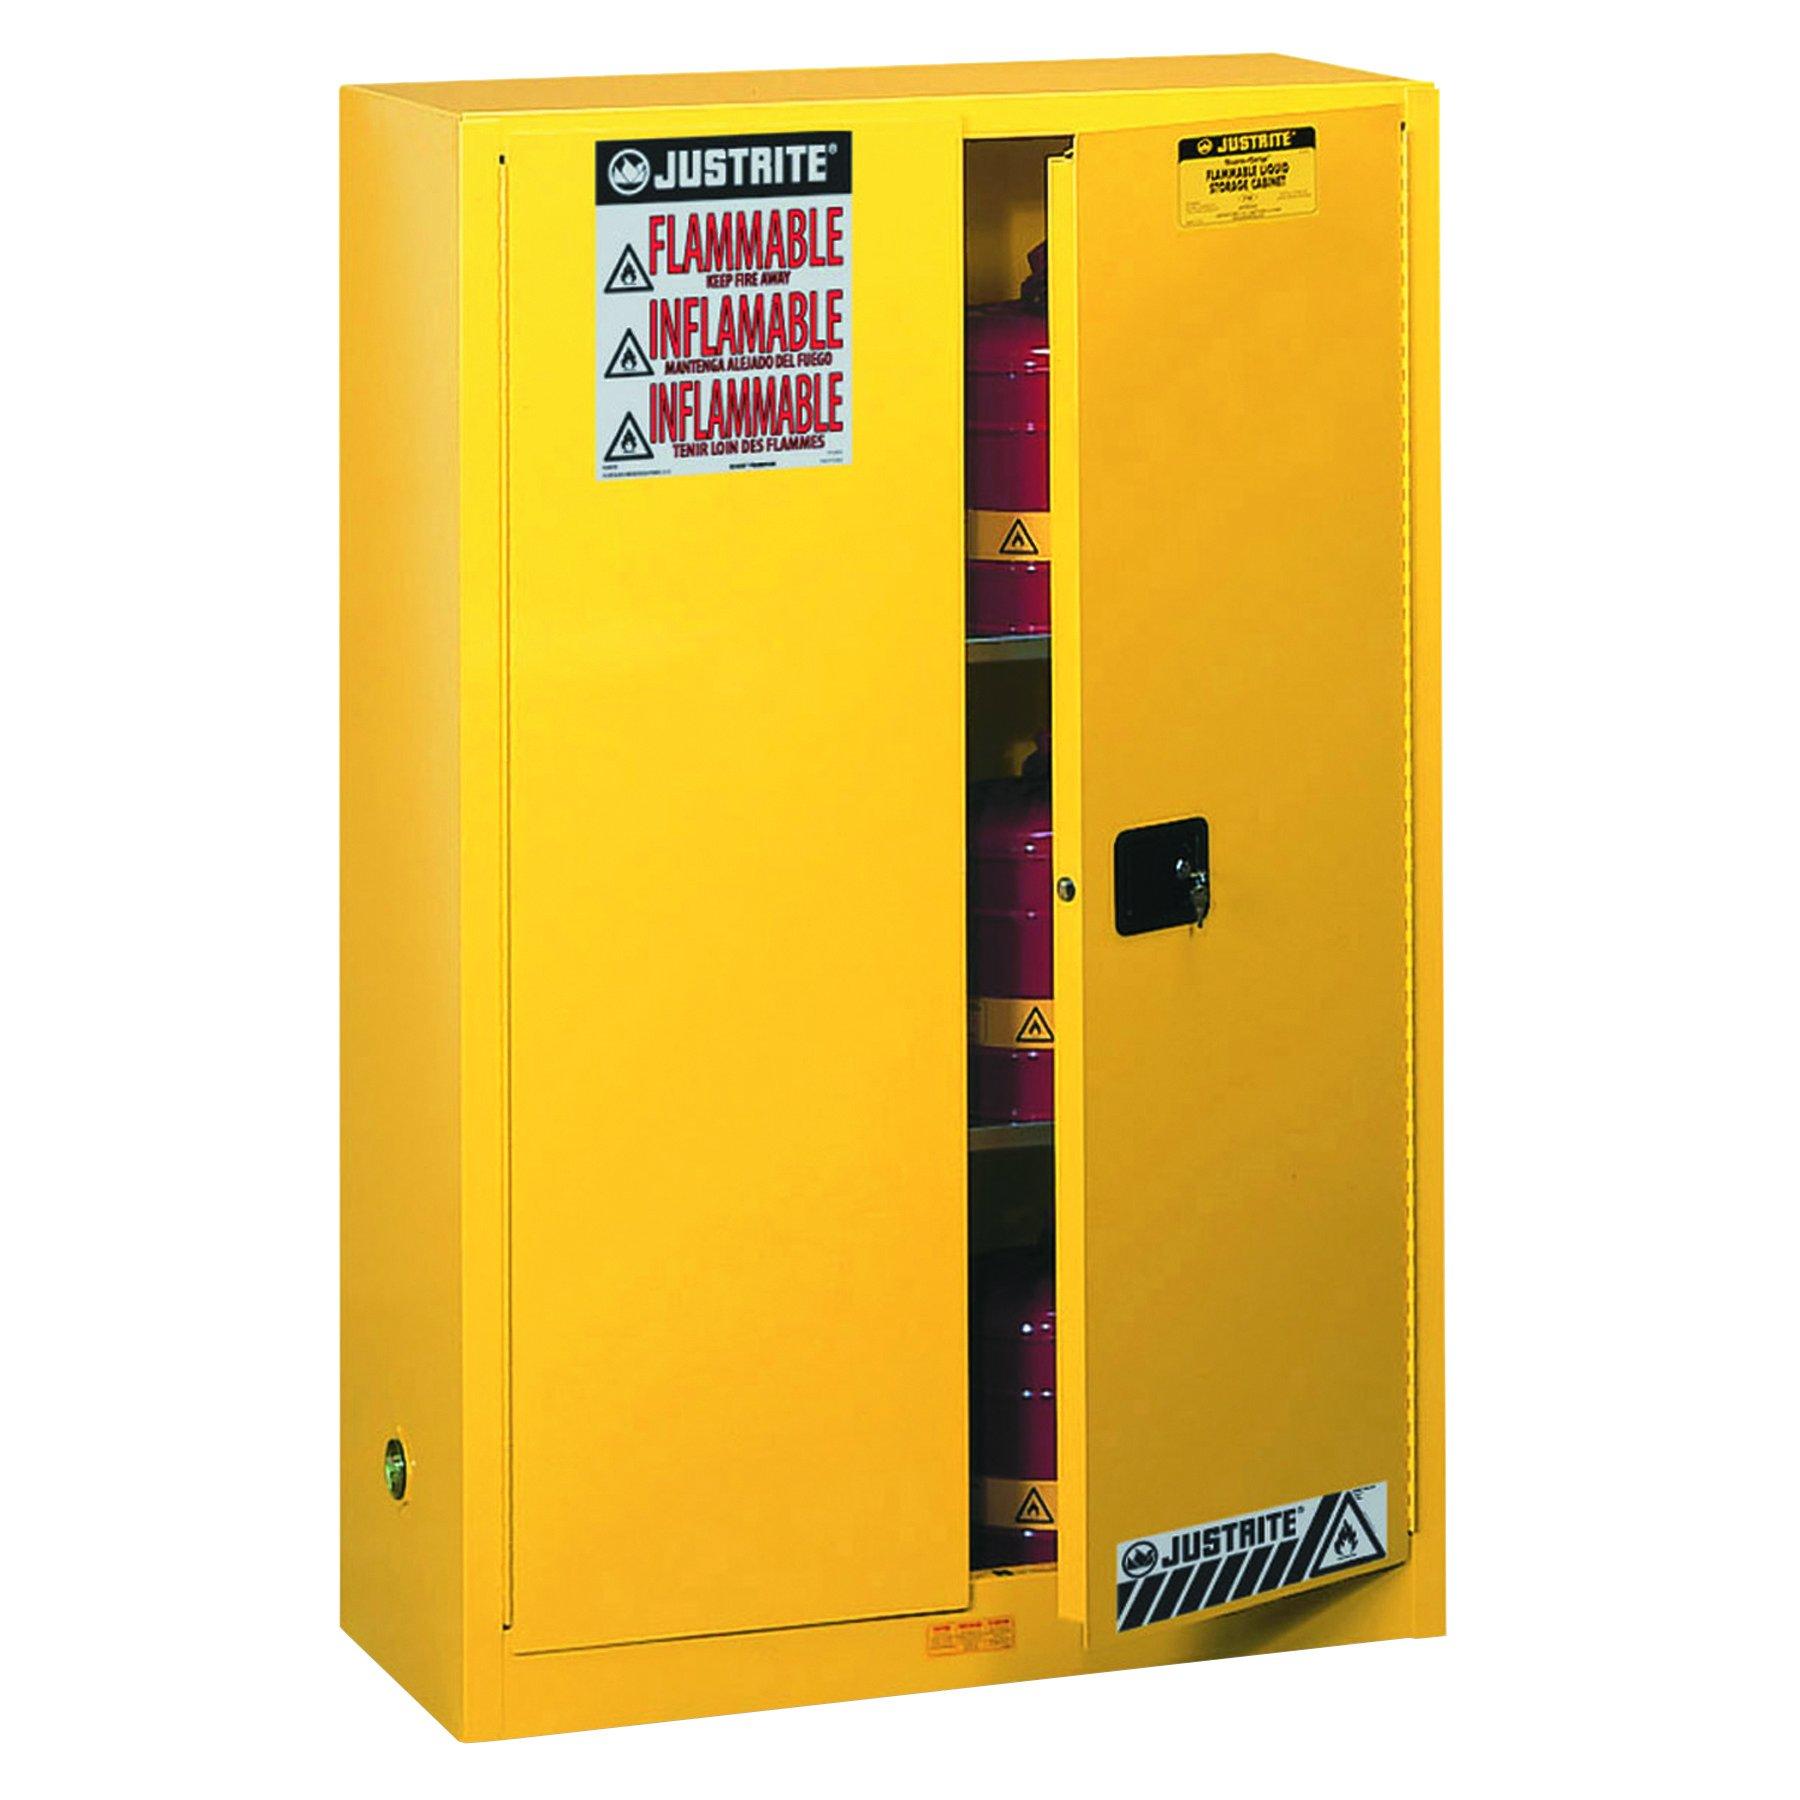 JUSTRITE 894500 Sure-Grip EX Standard Safety Cabinet, 43w x 18d x 65h, Yellow